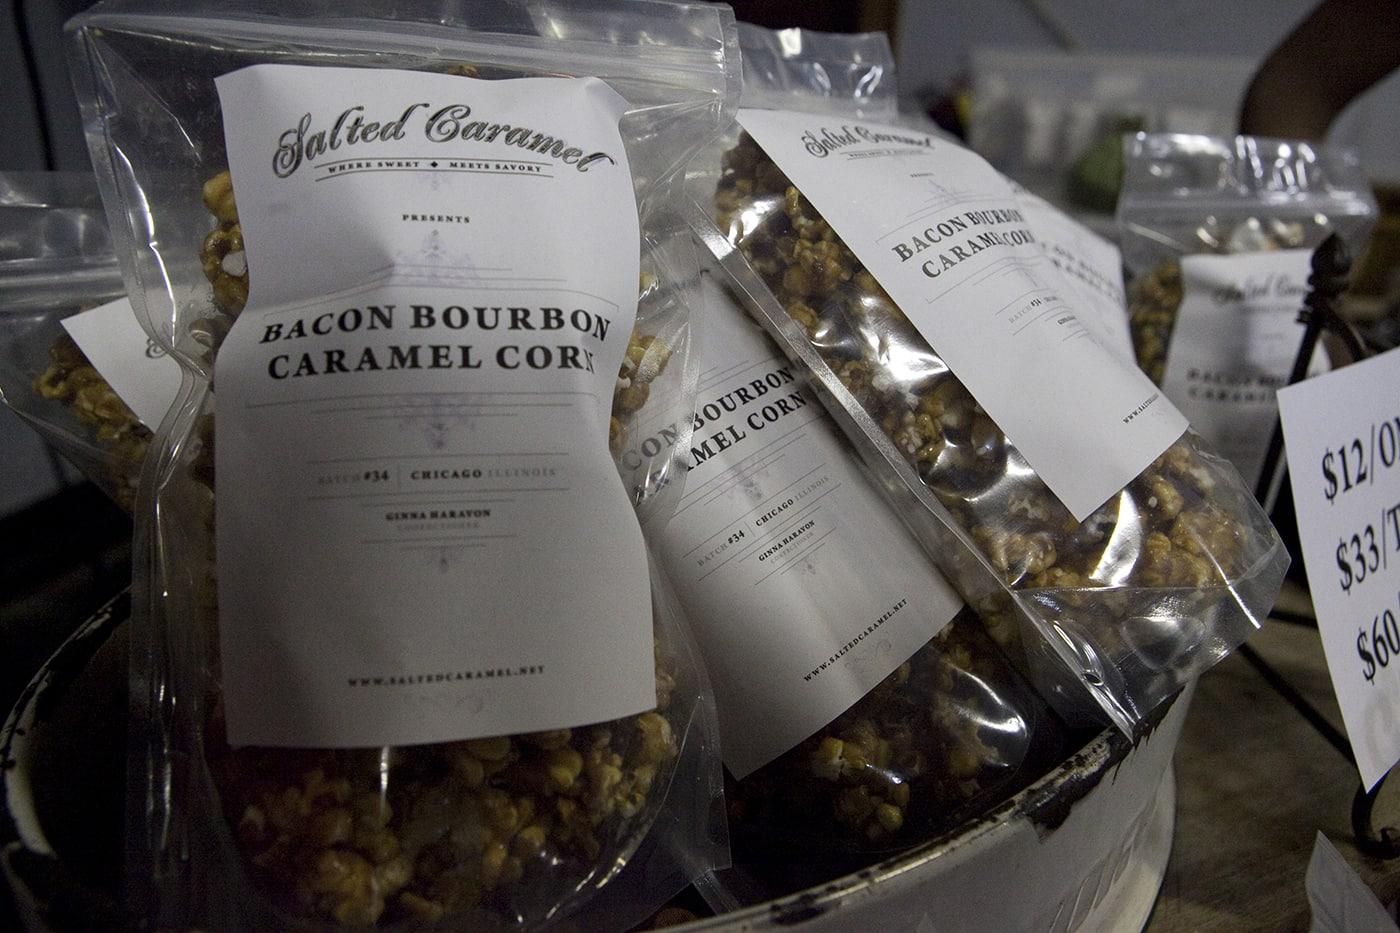 Bacon Bourbon Caramel popcorn at Baconfest Chicago - a bacon festival